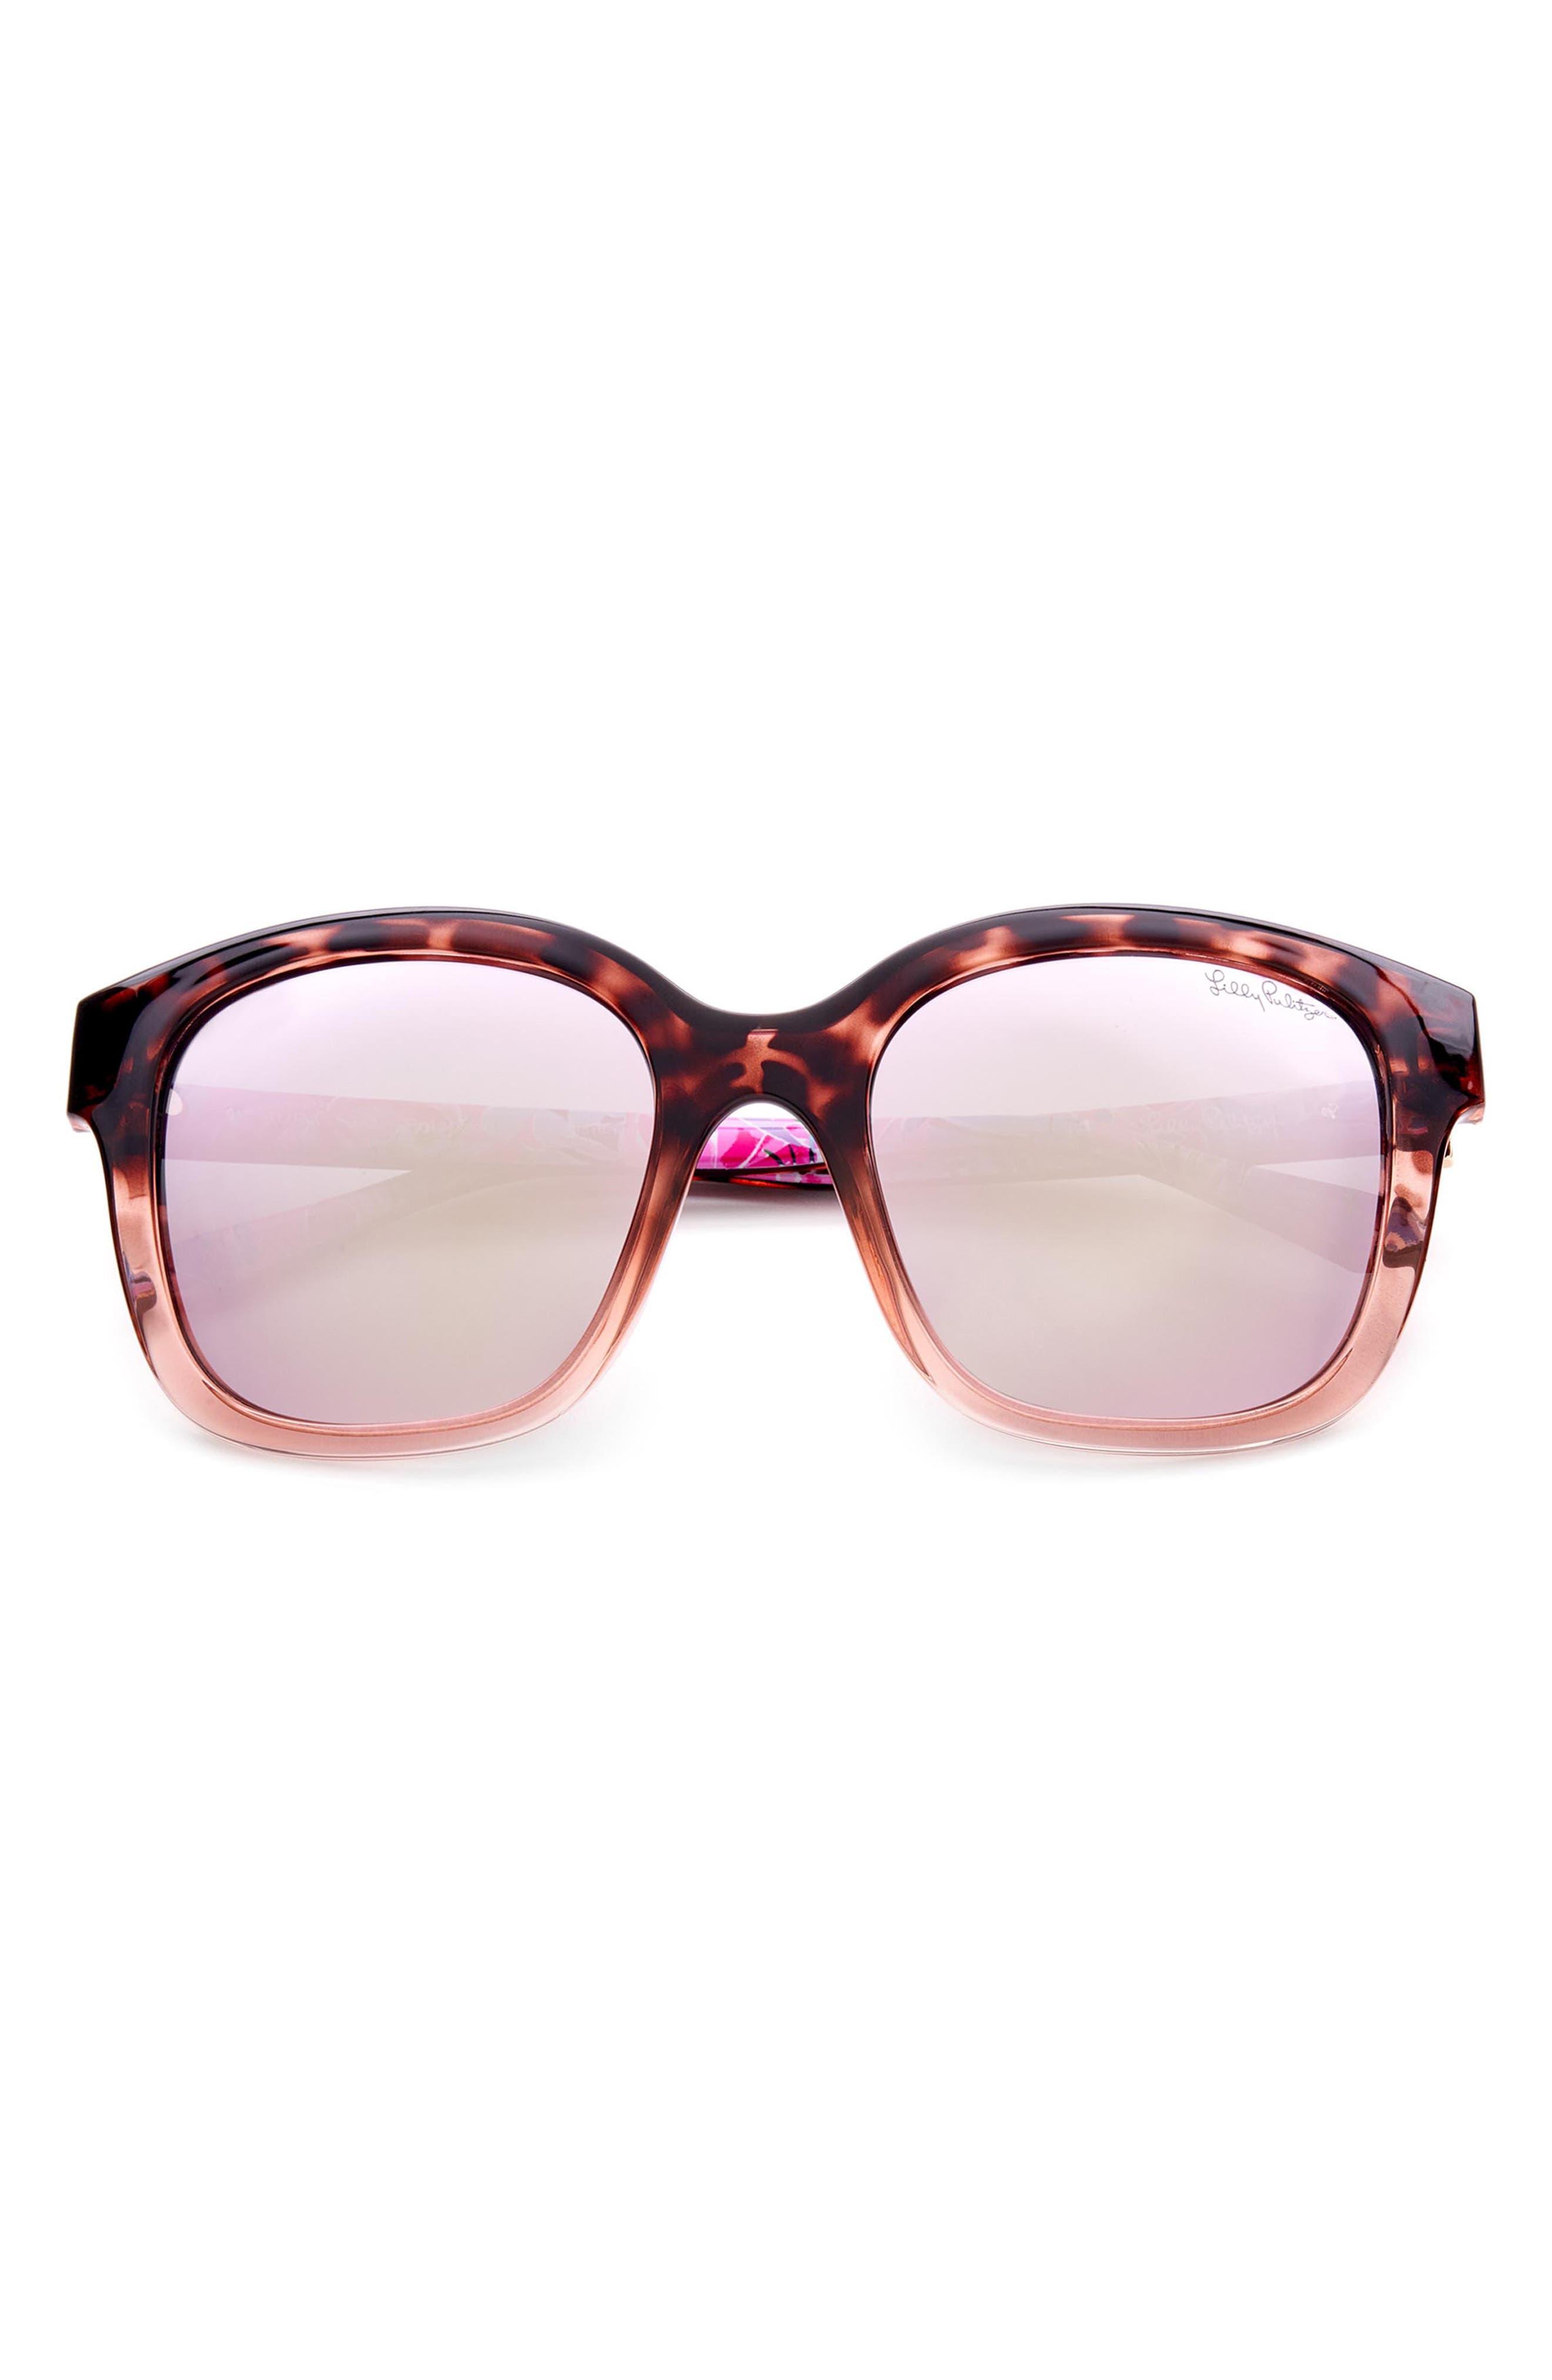 Women's Lilly Pulitzer 53mm Polarized Round Sunglasses